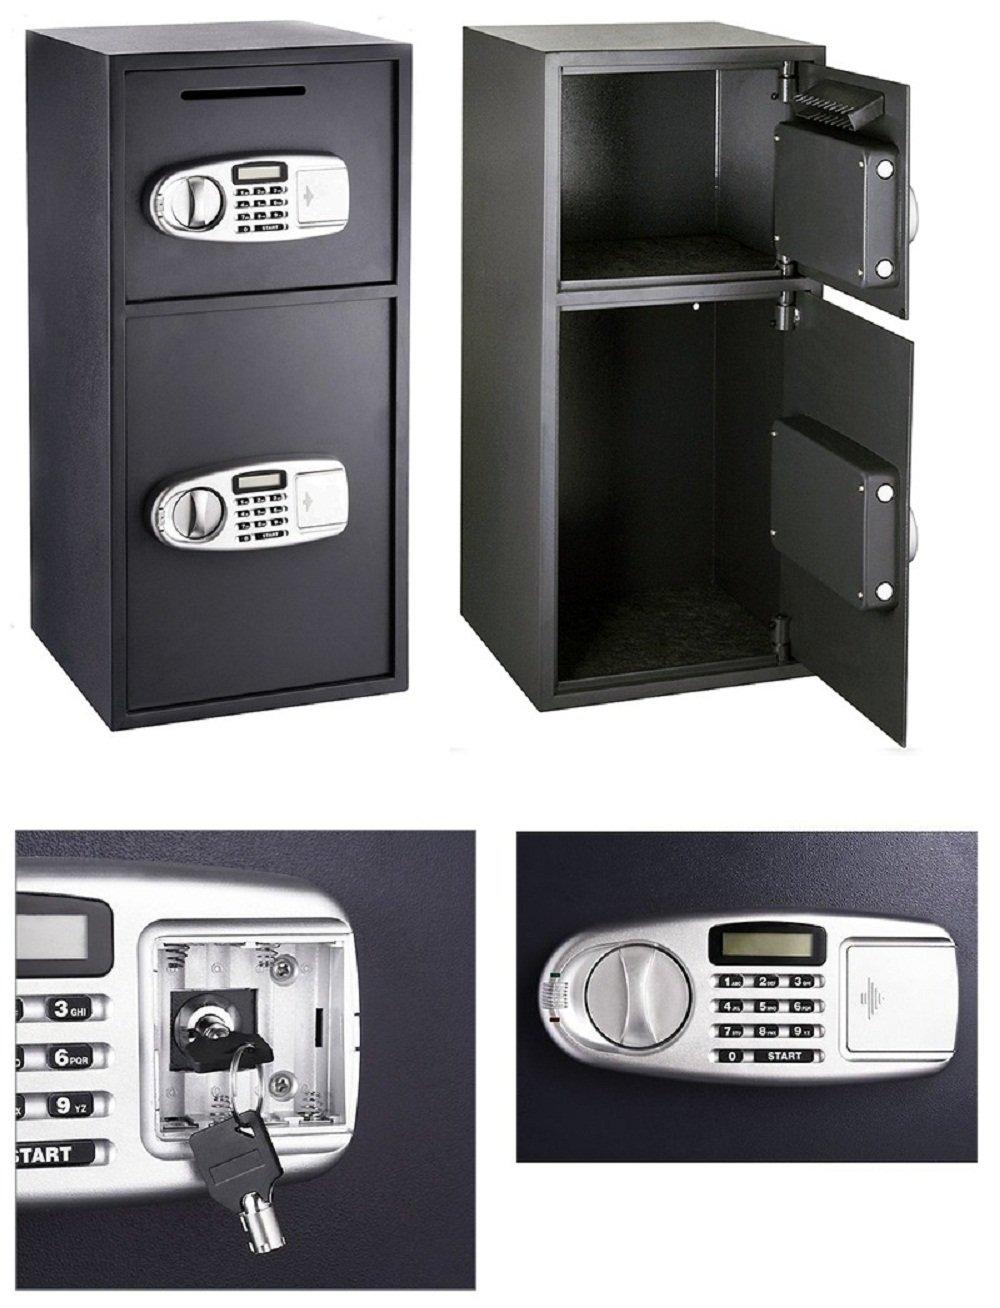 Digital Double Door Safe Depository Drop Box Safes Cash Office Security Lock by JDM Auto Lights